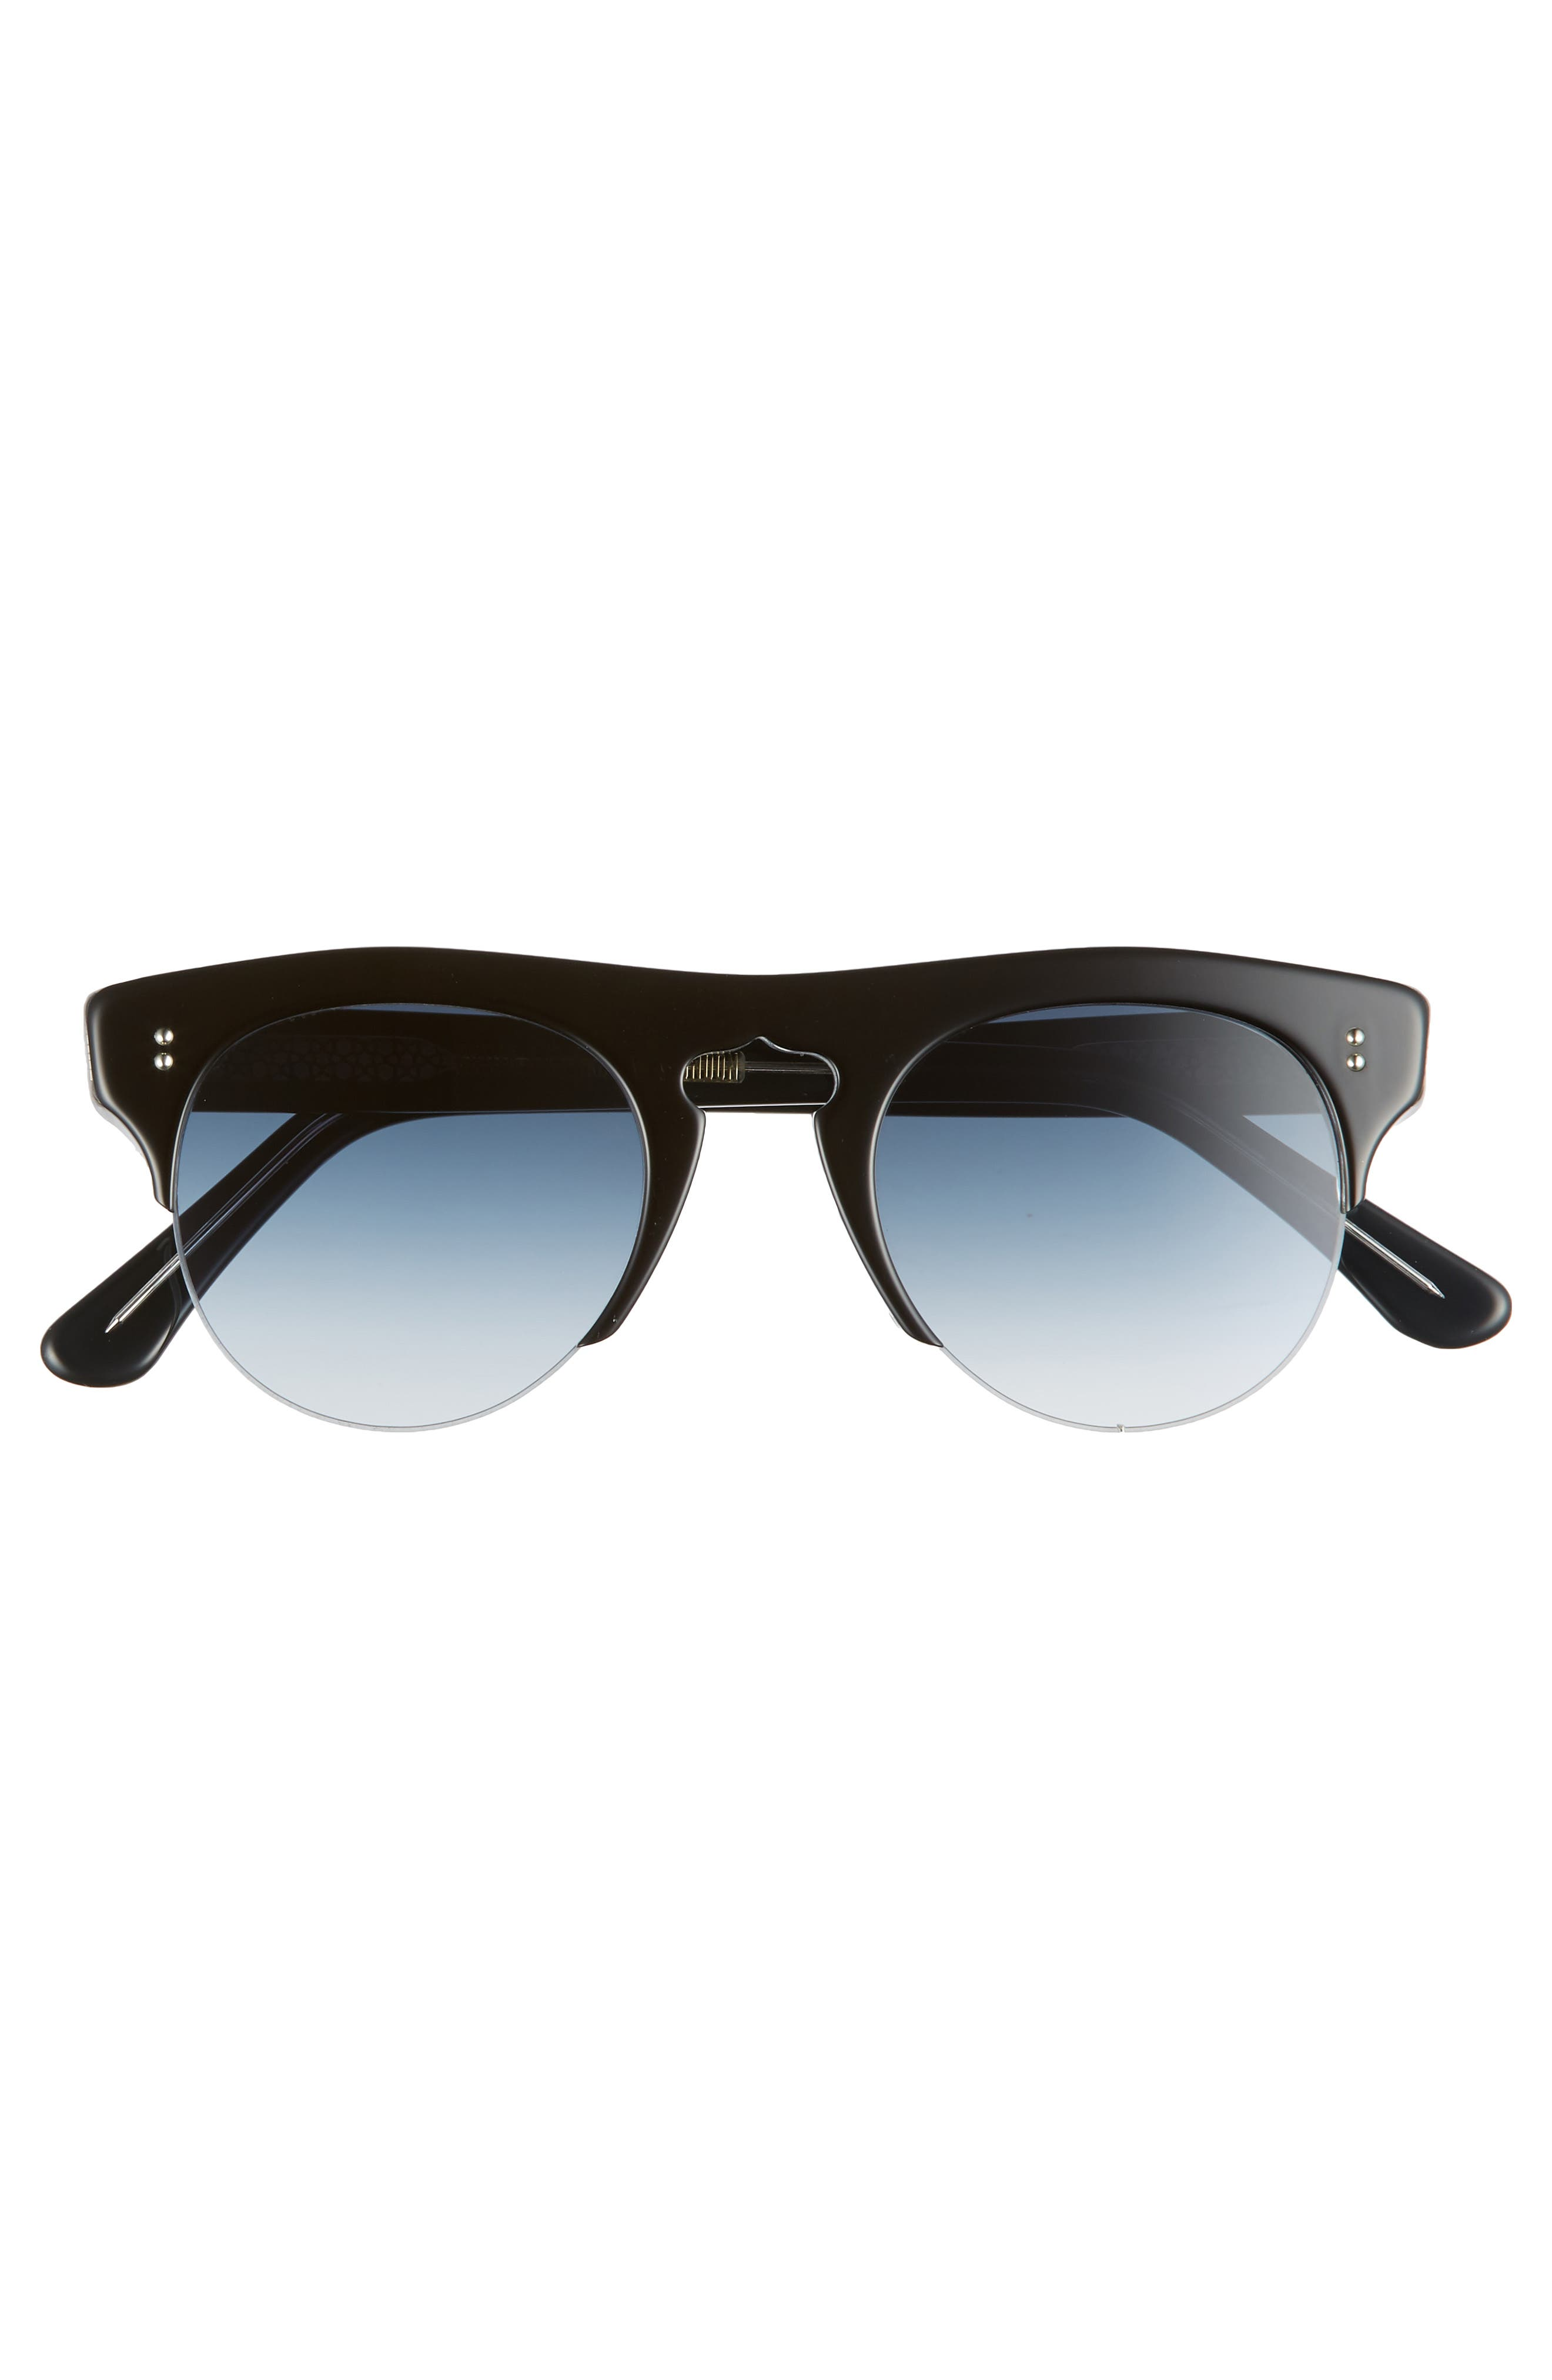 48mm Polarized Browline Sunglasses,                             Alternate thumbnail 2, color,                             BLACK ON CRYSTAL/ BLUE